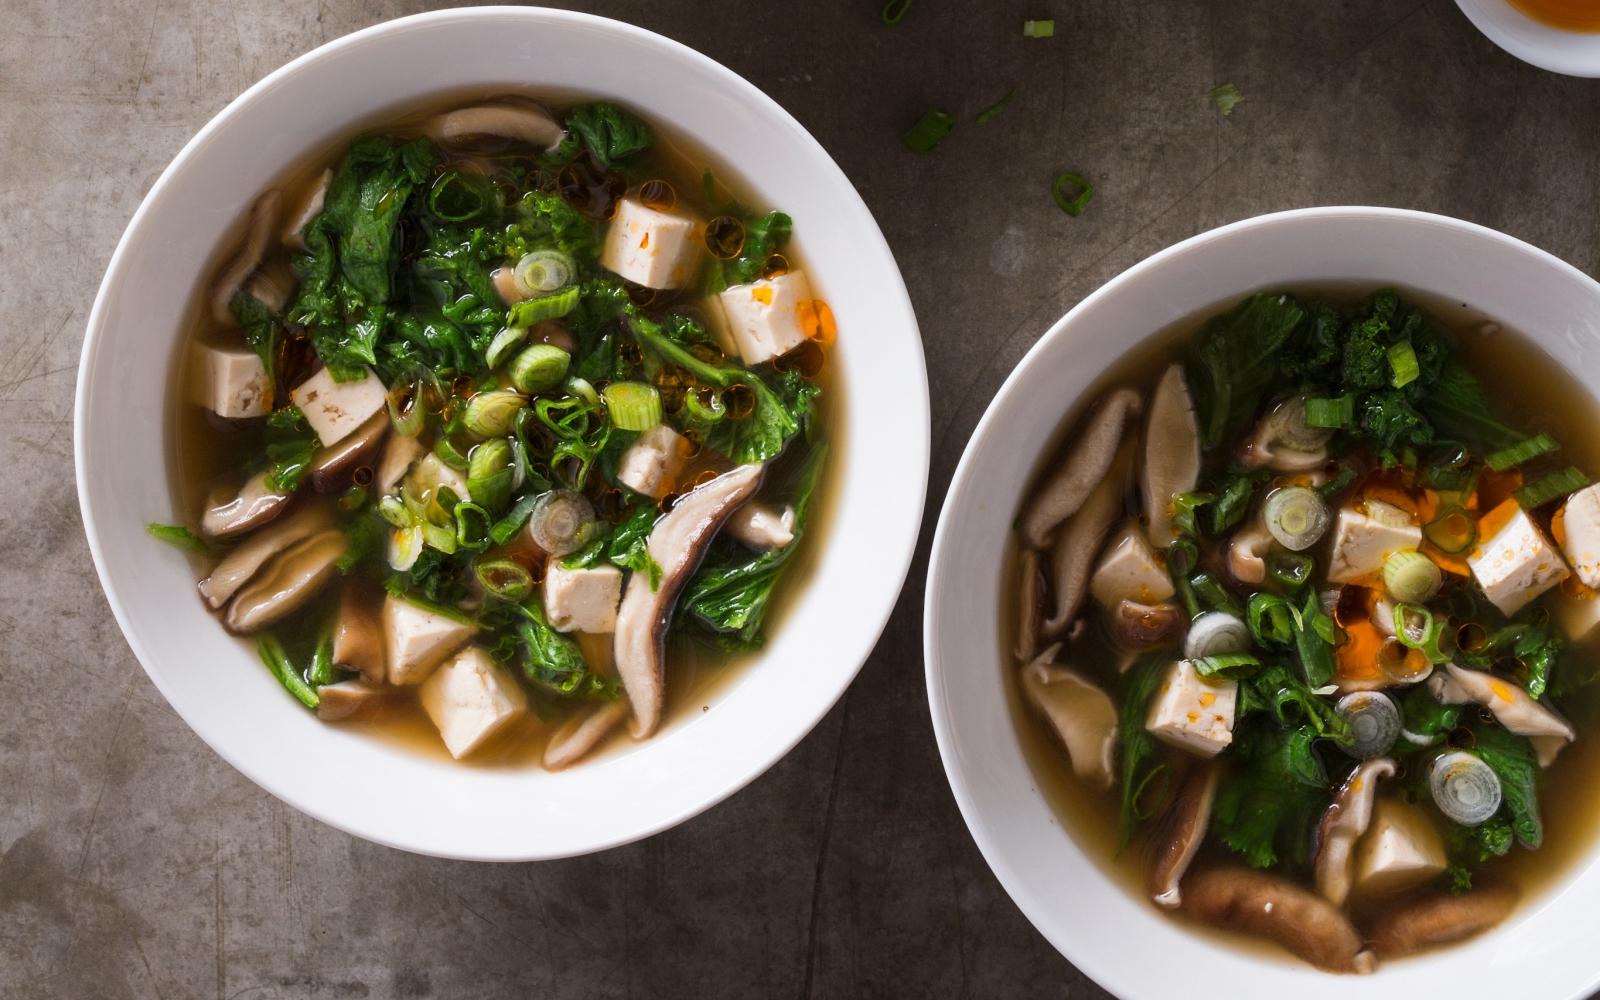 Vegan Shiitake Tofu and Mustard Greens Soup